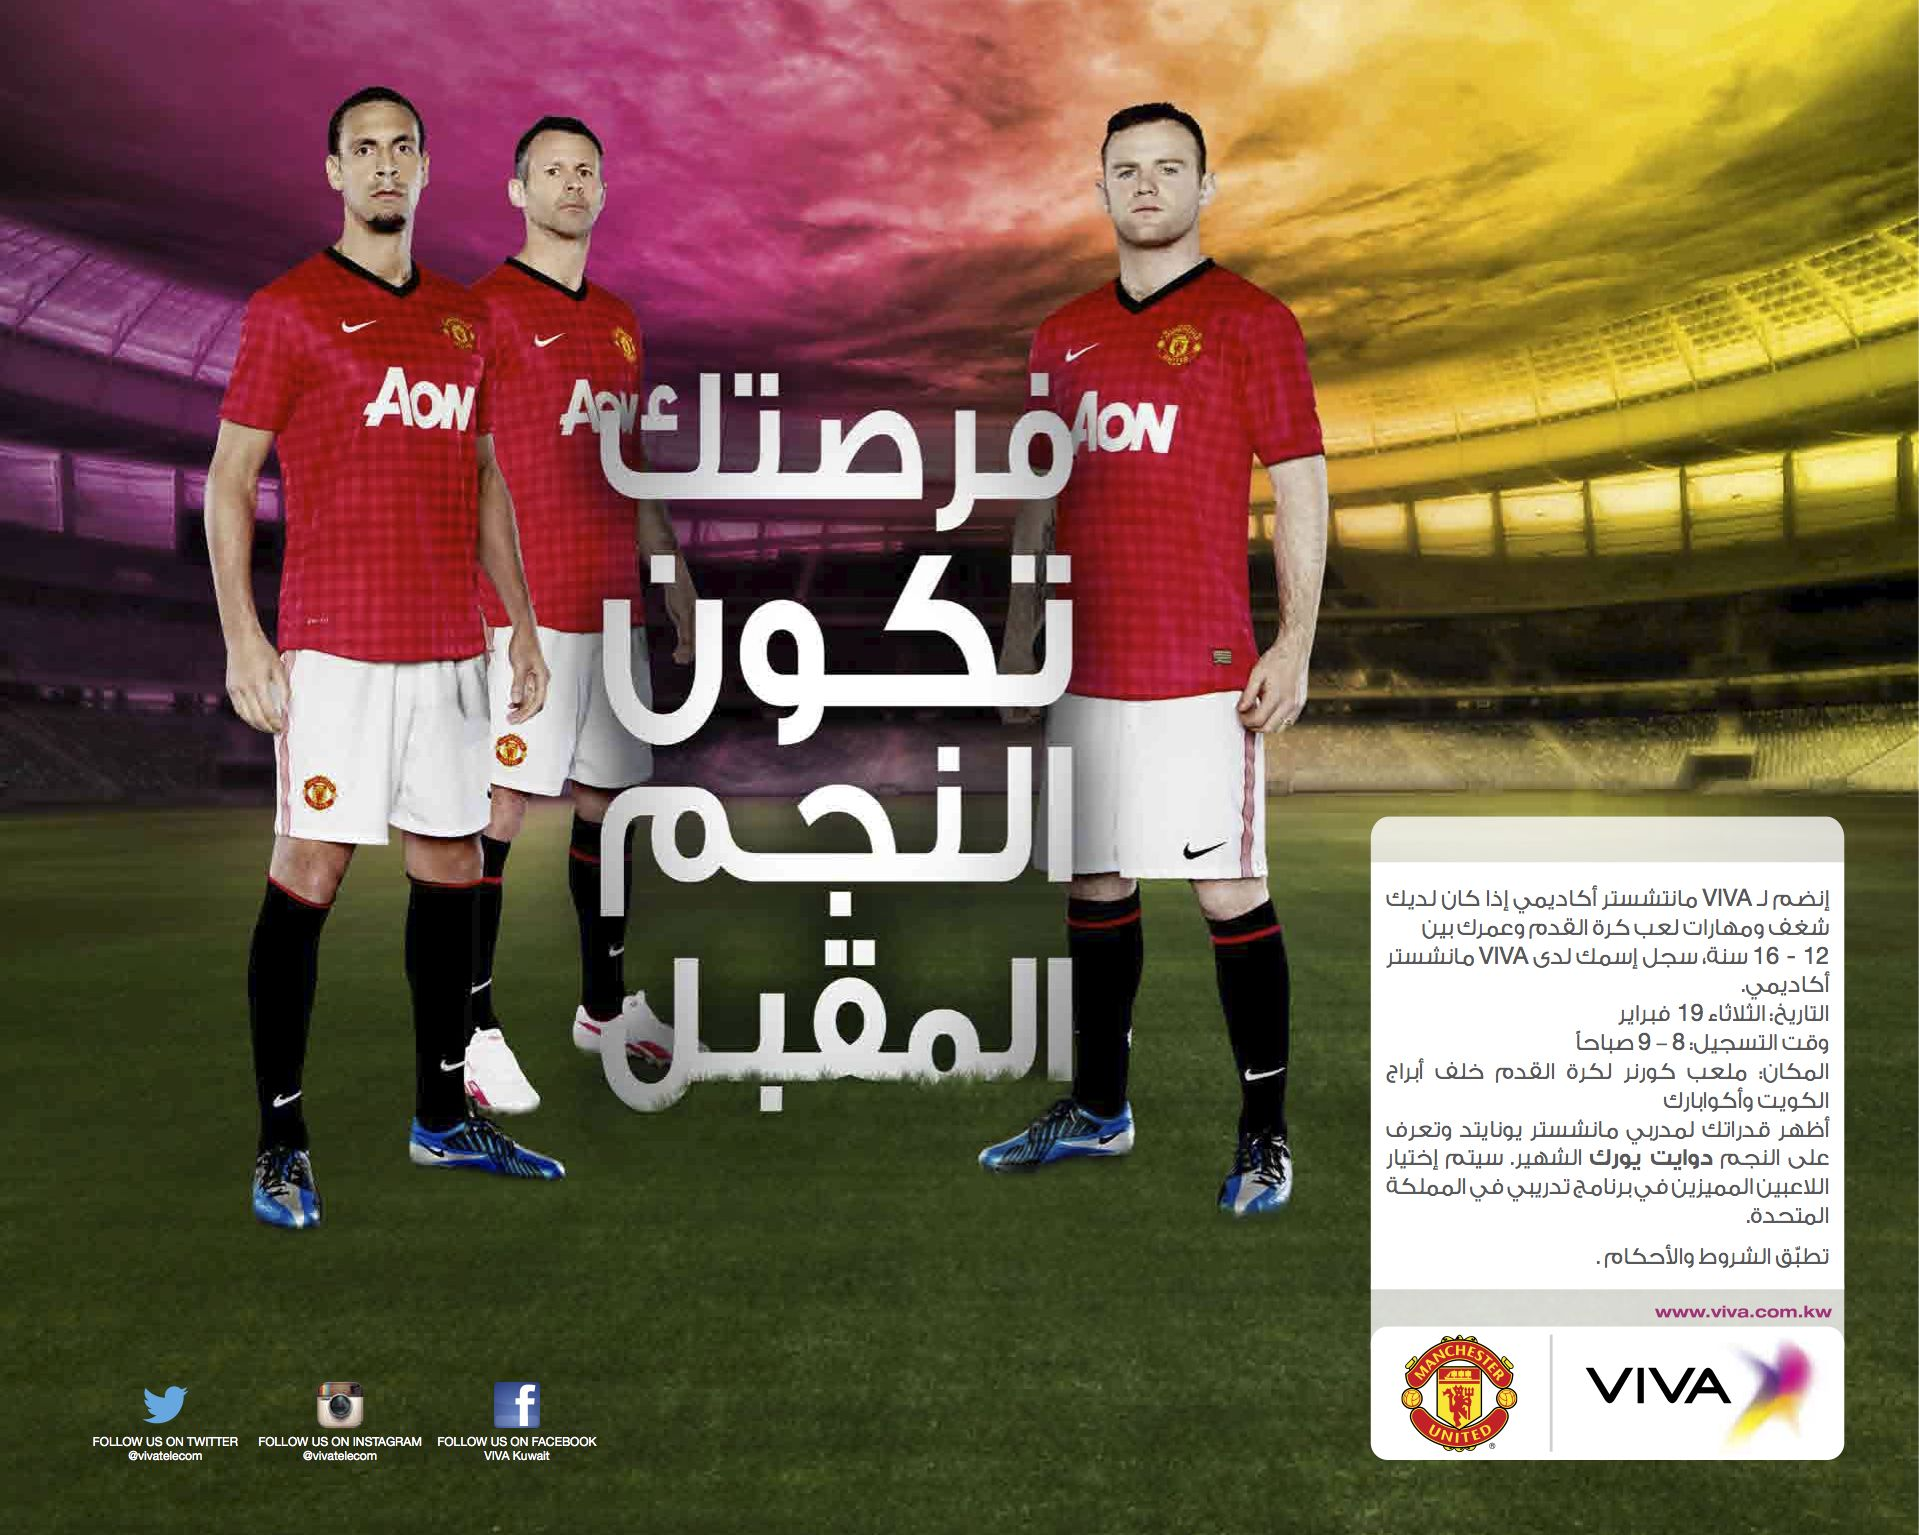 Viva تطلق الدورة الثانية لإكاديمية مانشستر يونايتد لكرة القدم أعلنت Viva عن استضافة دوايت يورك نجم مانشستر يونايتد للمشاركة في Baseball Cards Sports Poster